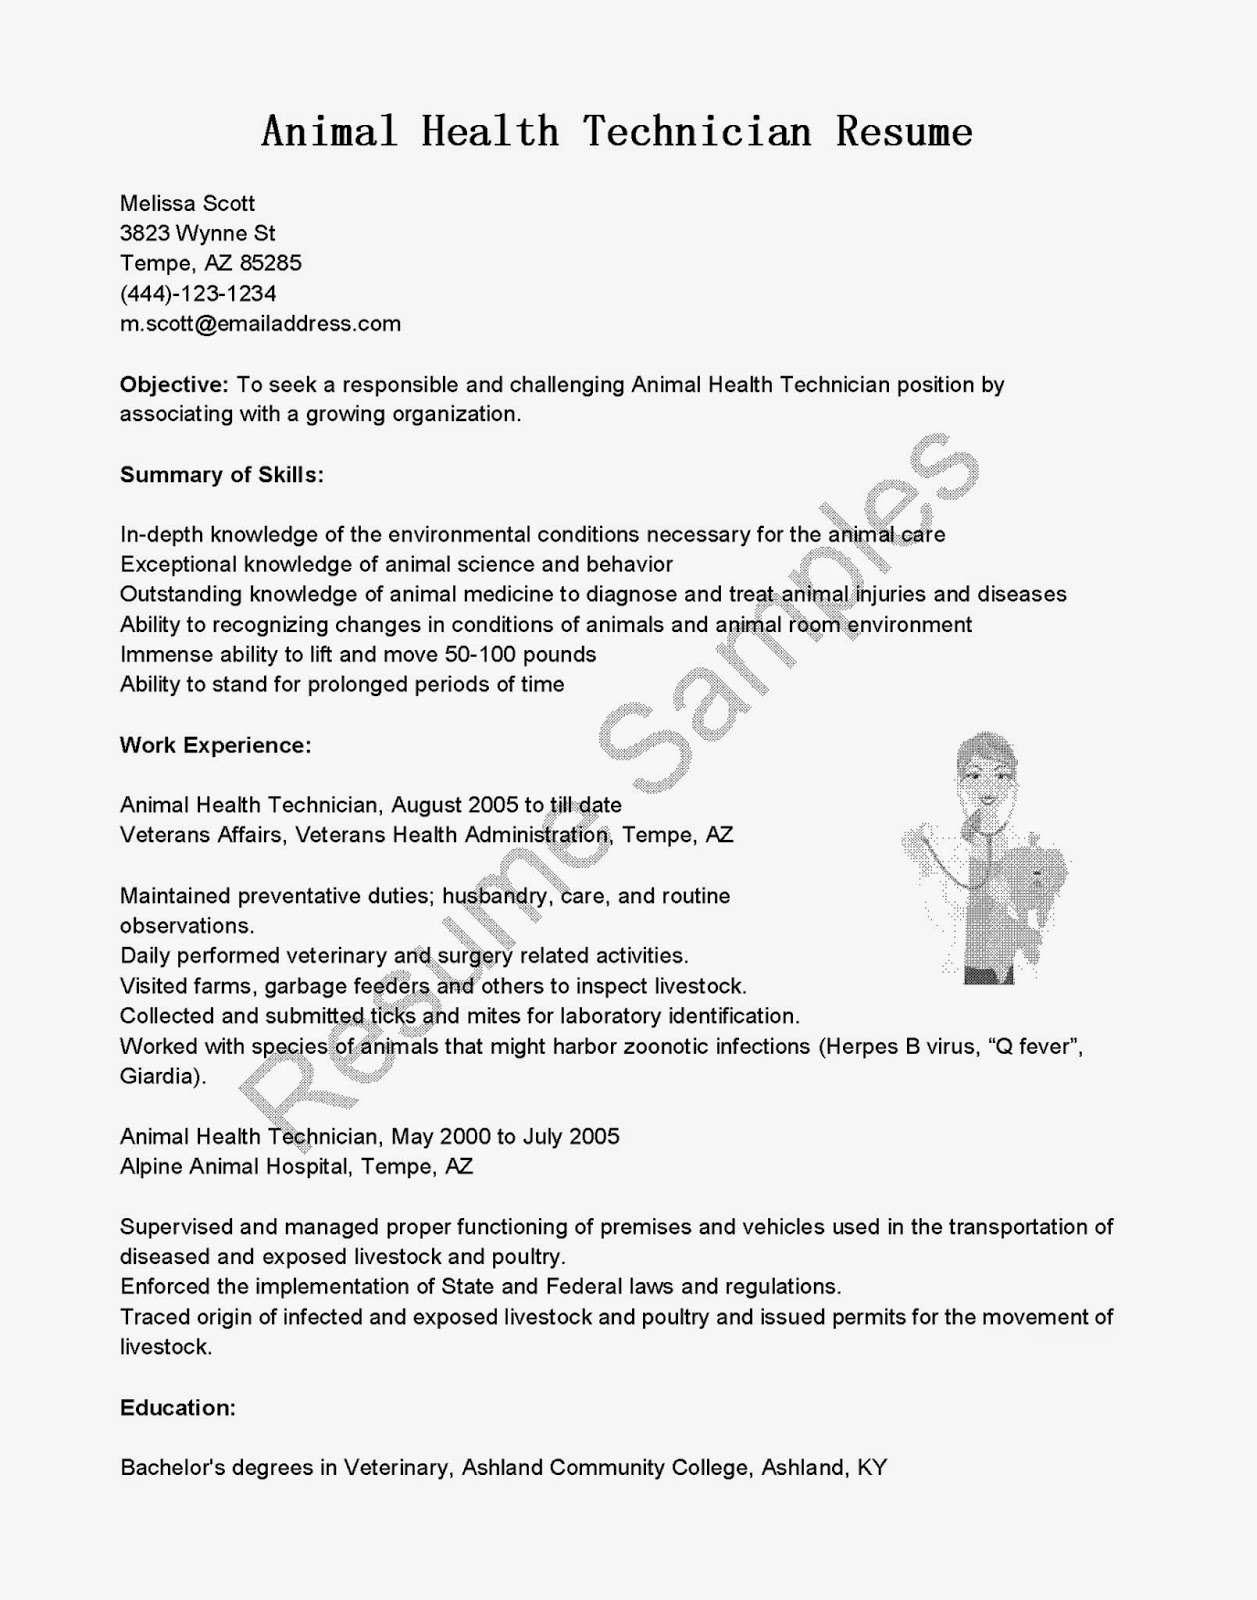 resume samples  animal health technician resume sample